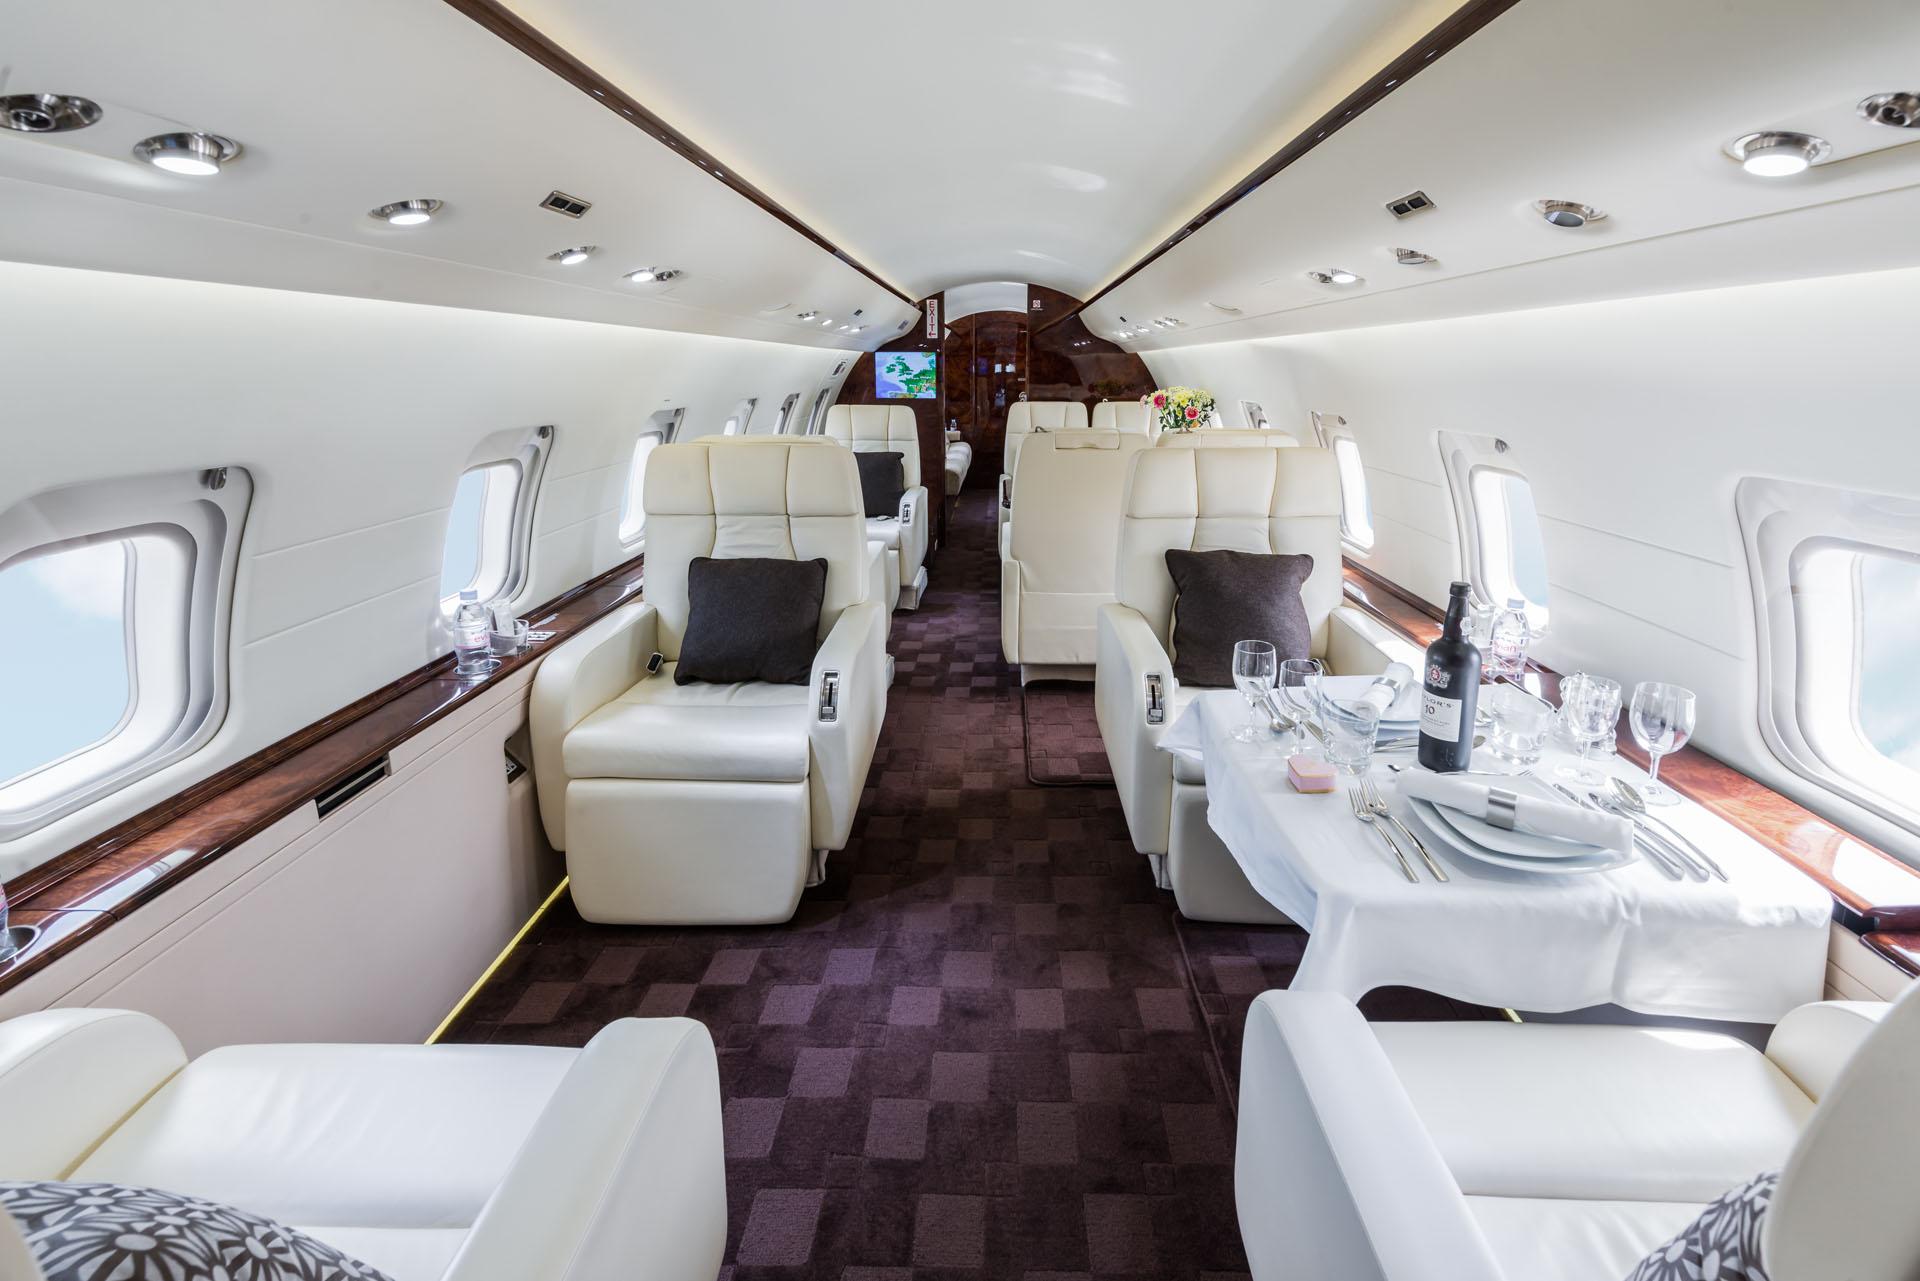 luxury jet ghana